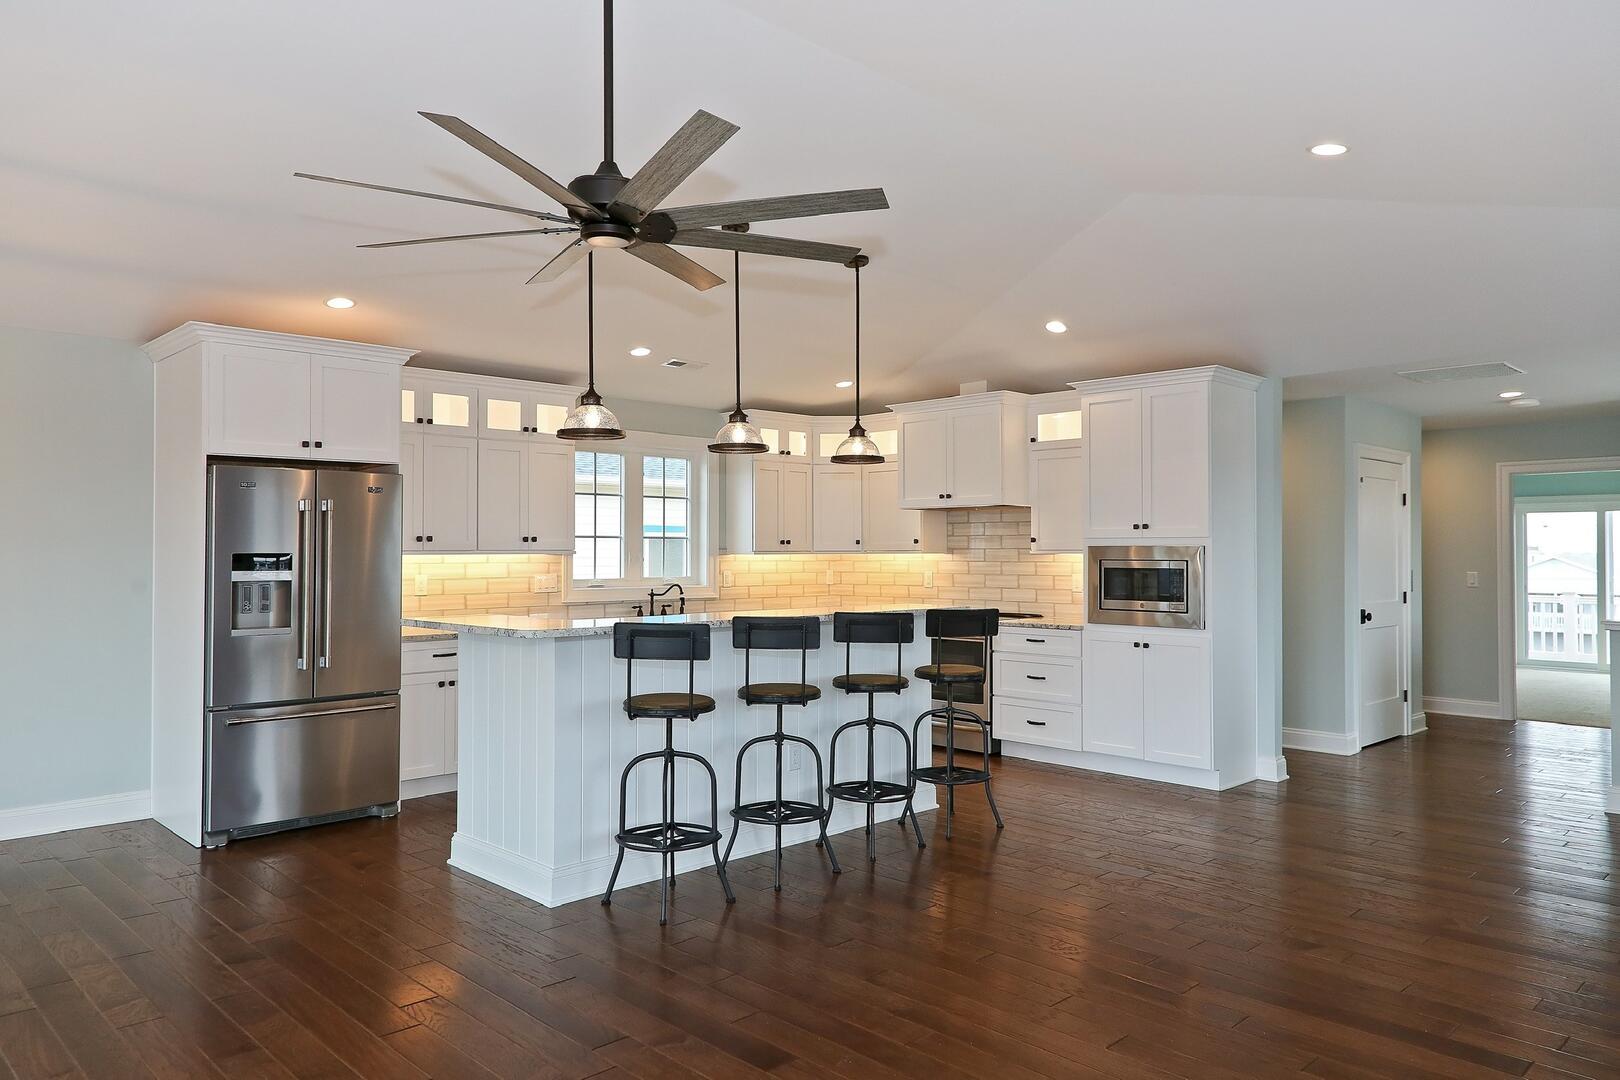 Kitchen - 1611 King and Coastal